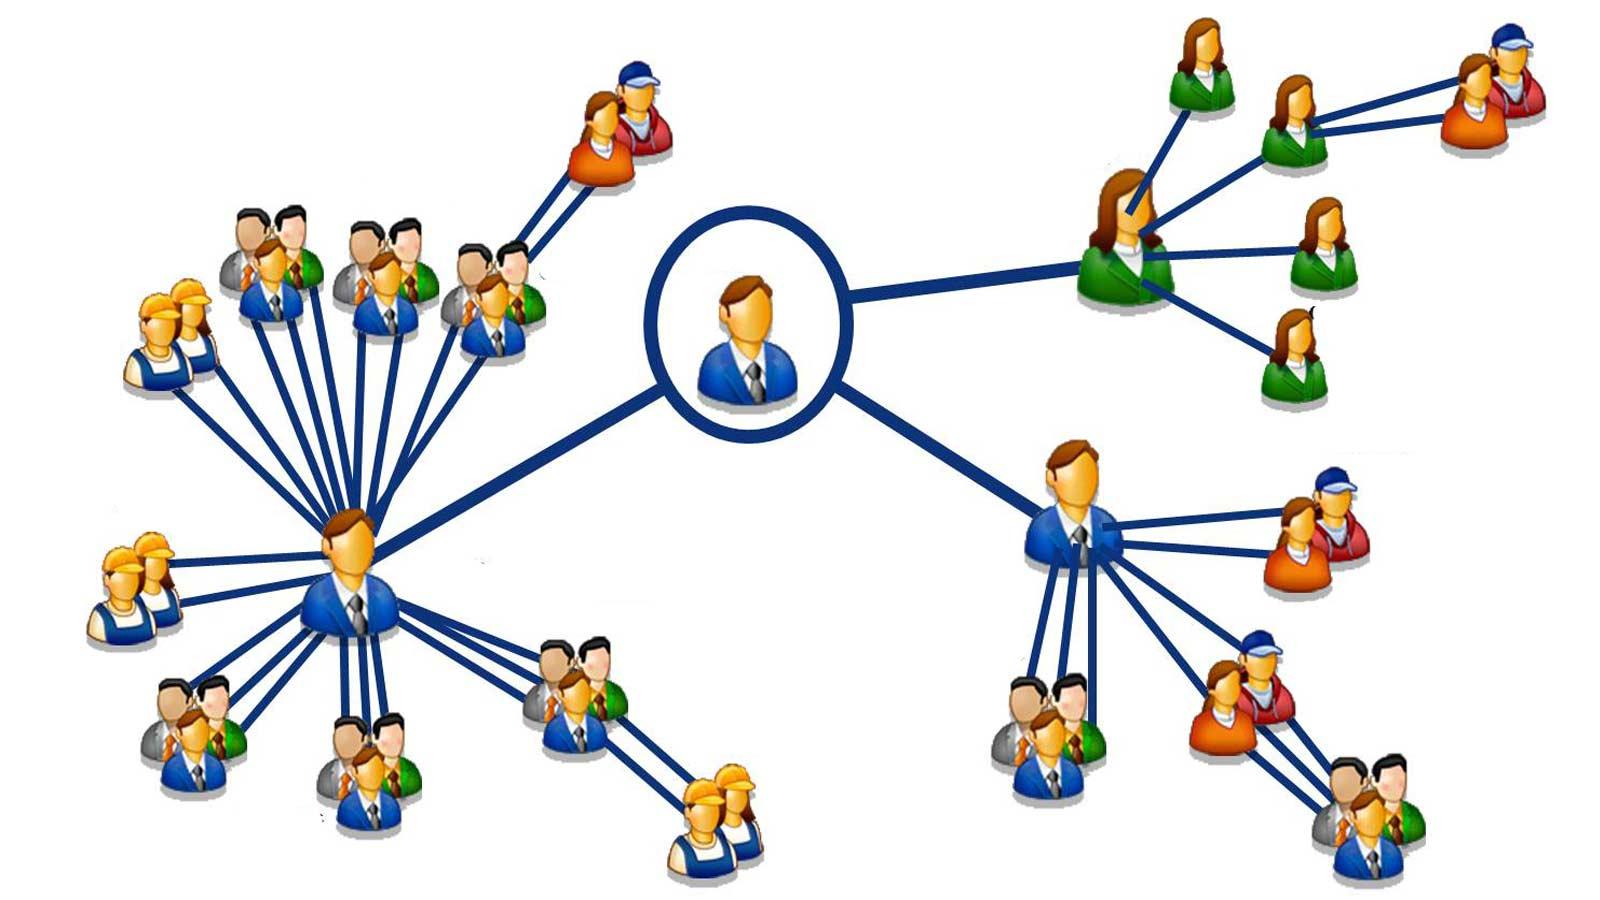 network marketing بازاری شبکه ای نتورک مارکتینگ بازاری چند سطحی multi-level marketing